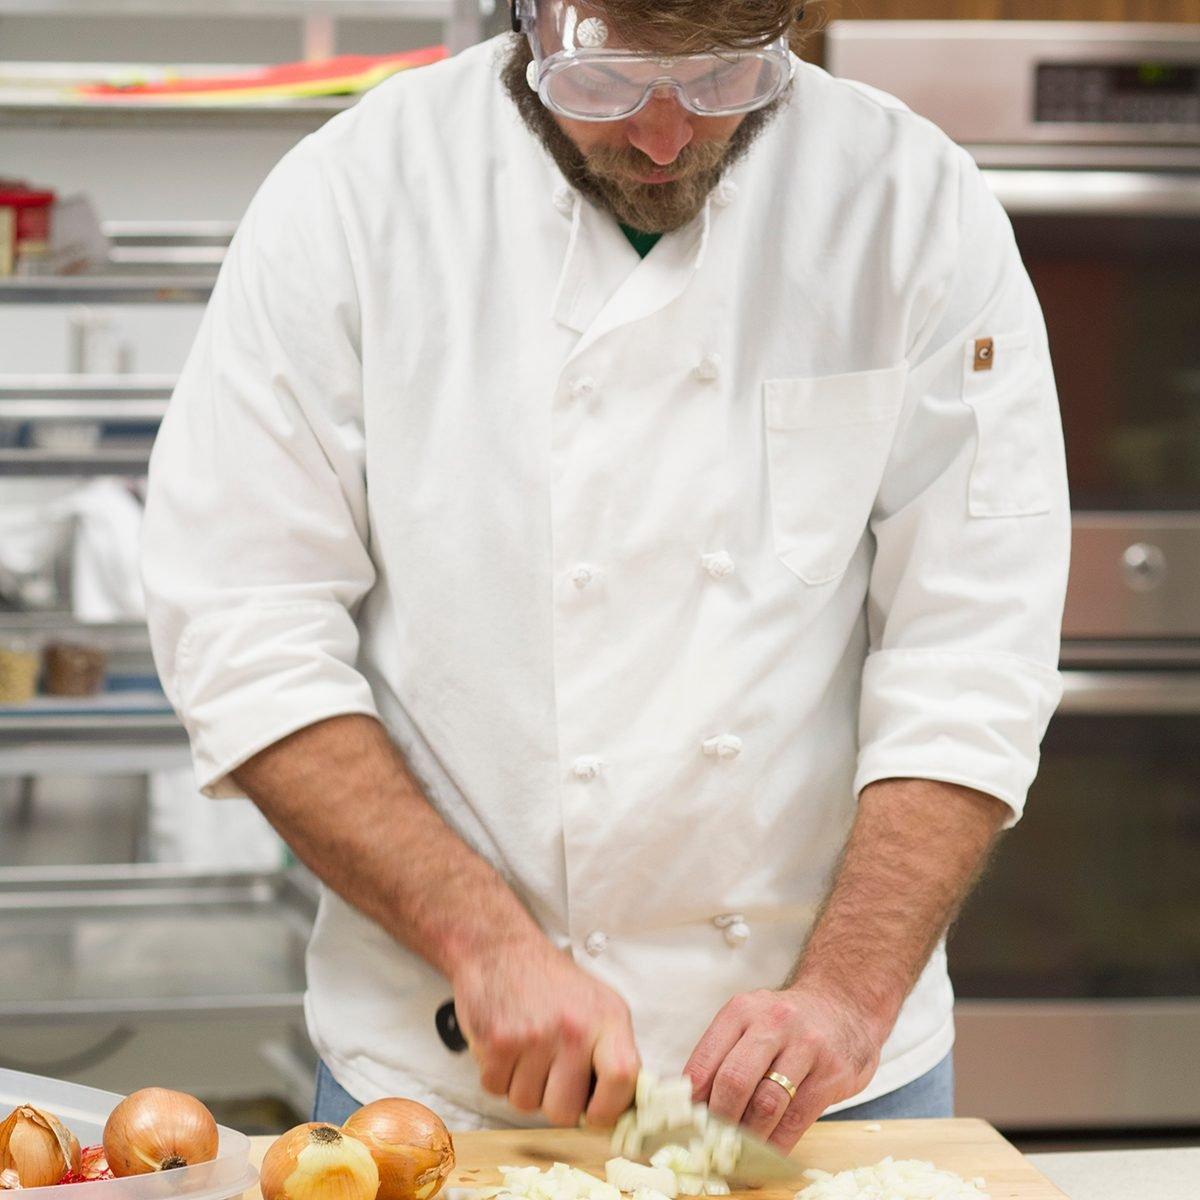 Chef cutting onions